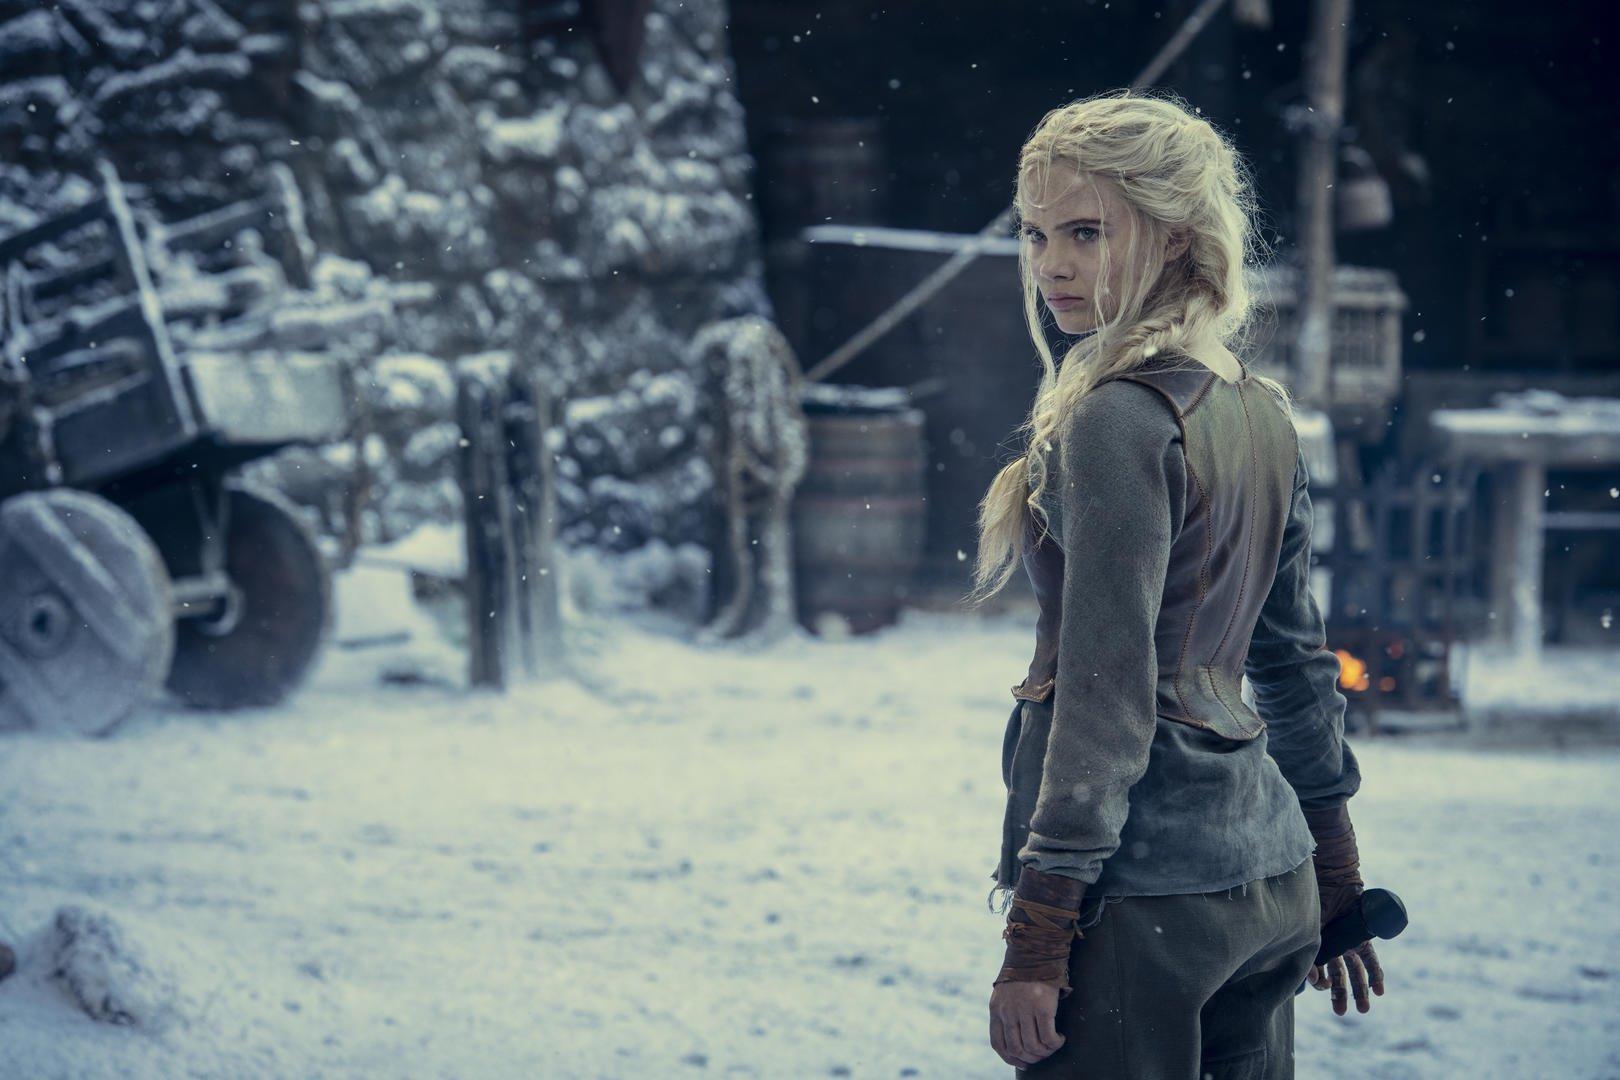 The Witcher season 2 - Ciri at Kaer Morhen Mor